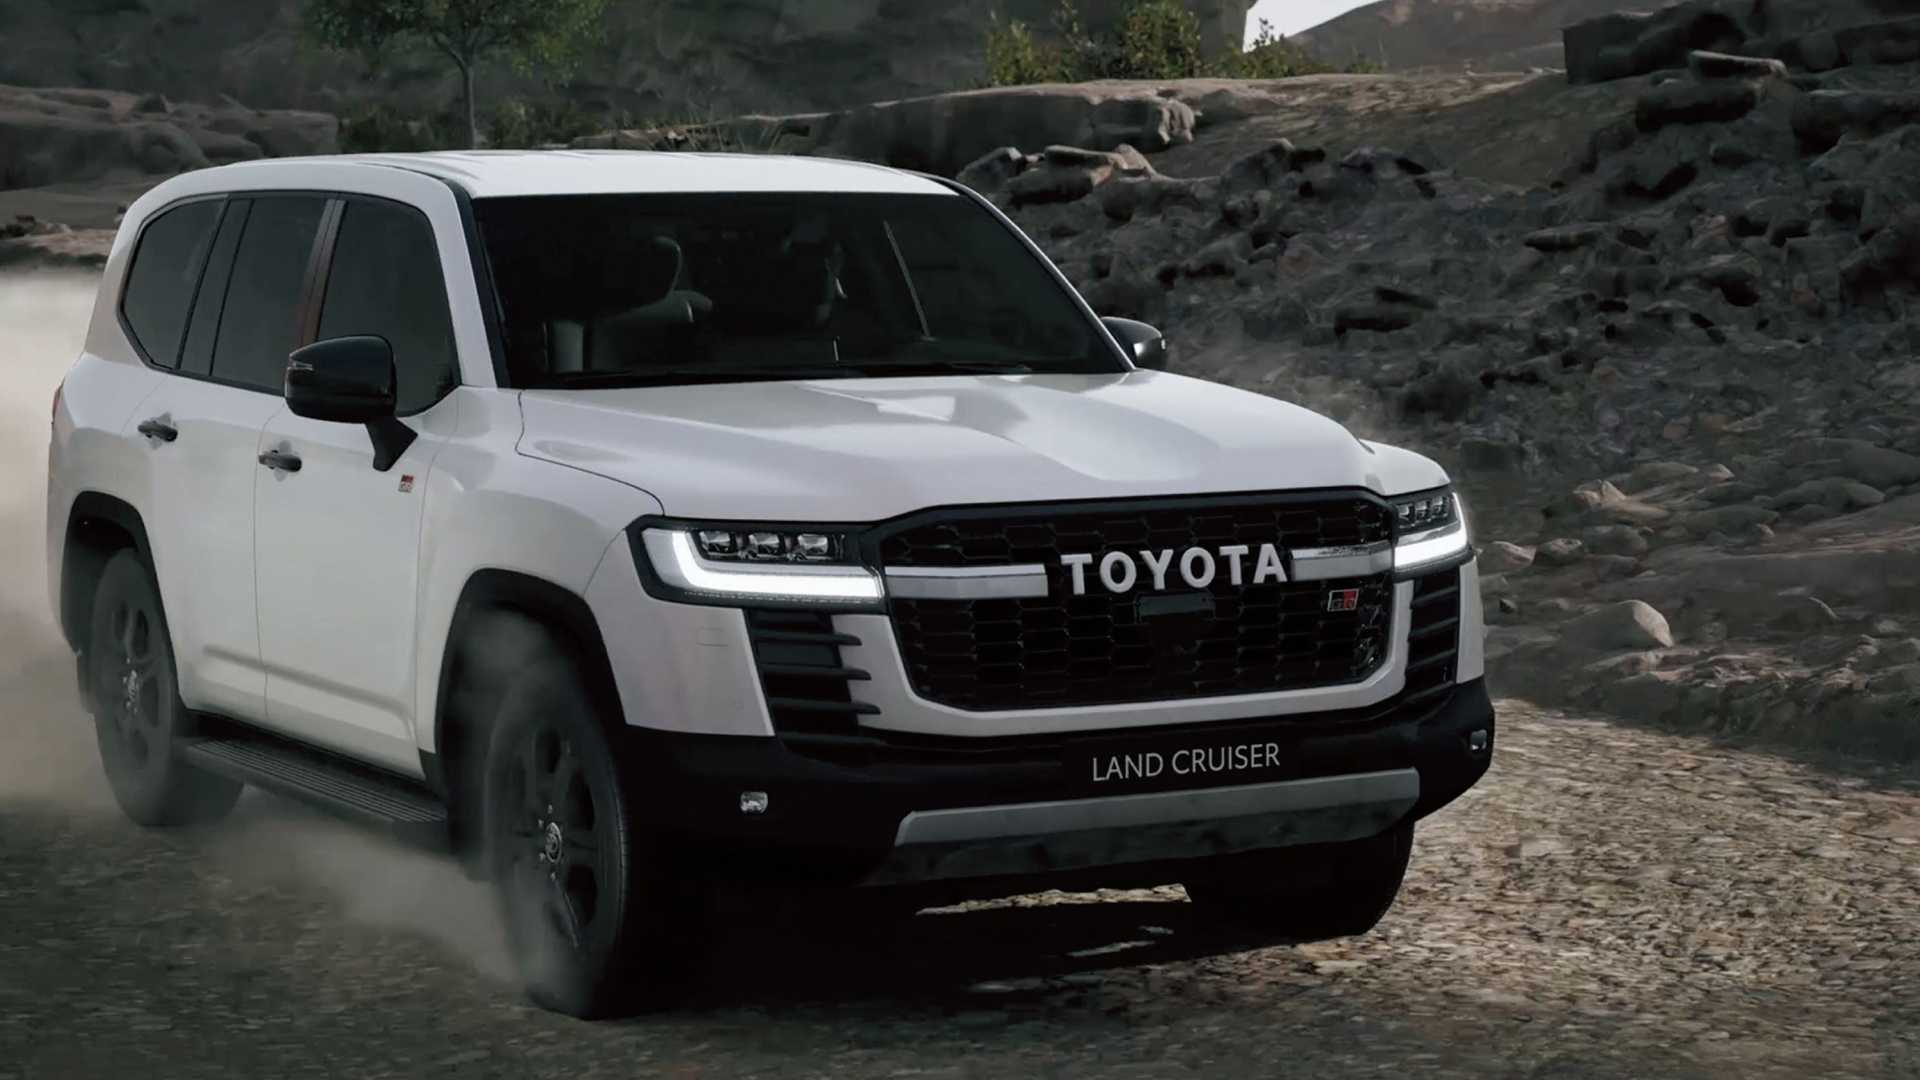 Toyota Land Cruiser 300 GR-S